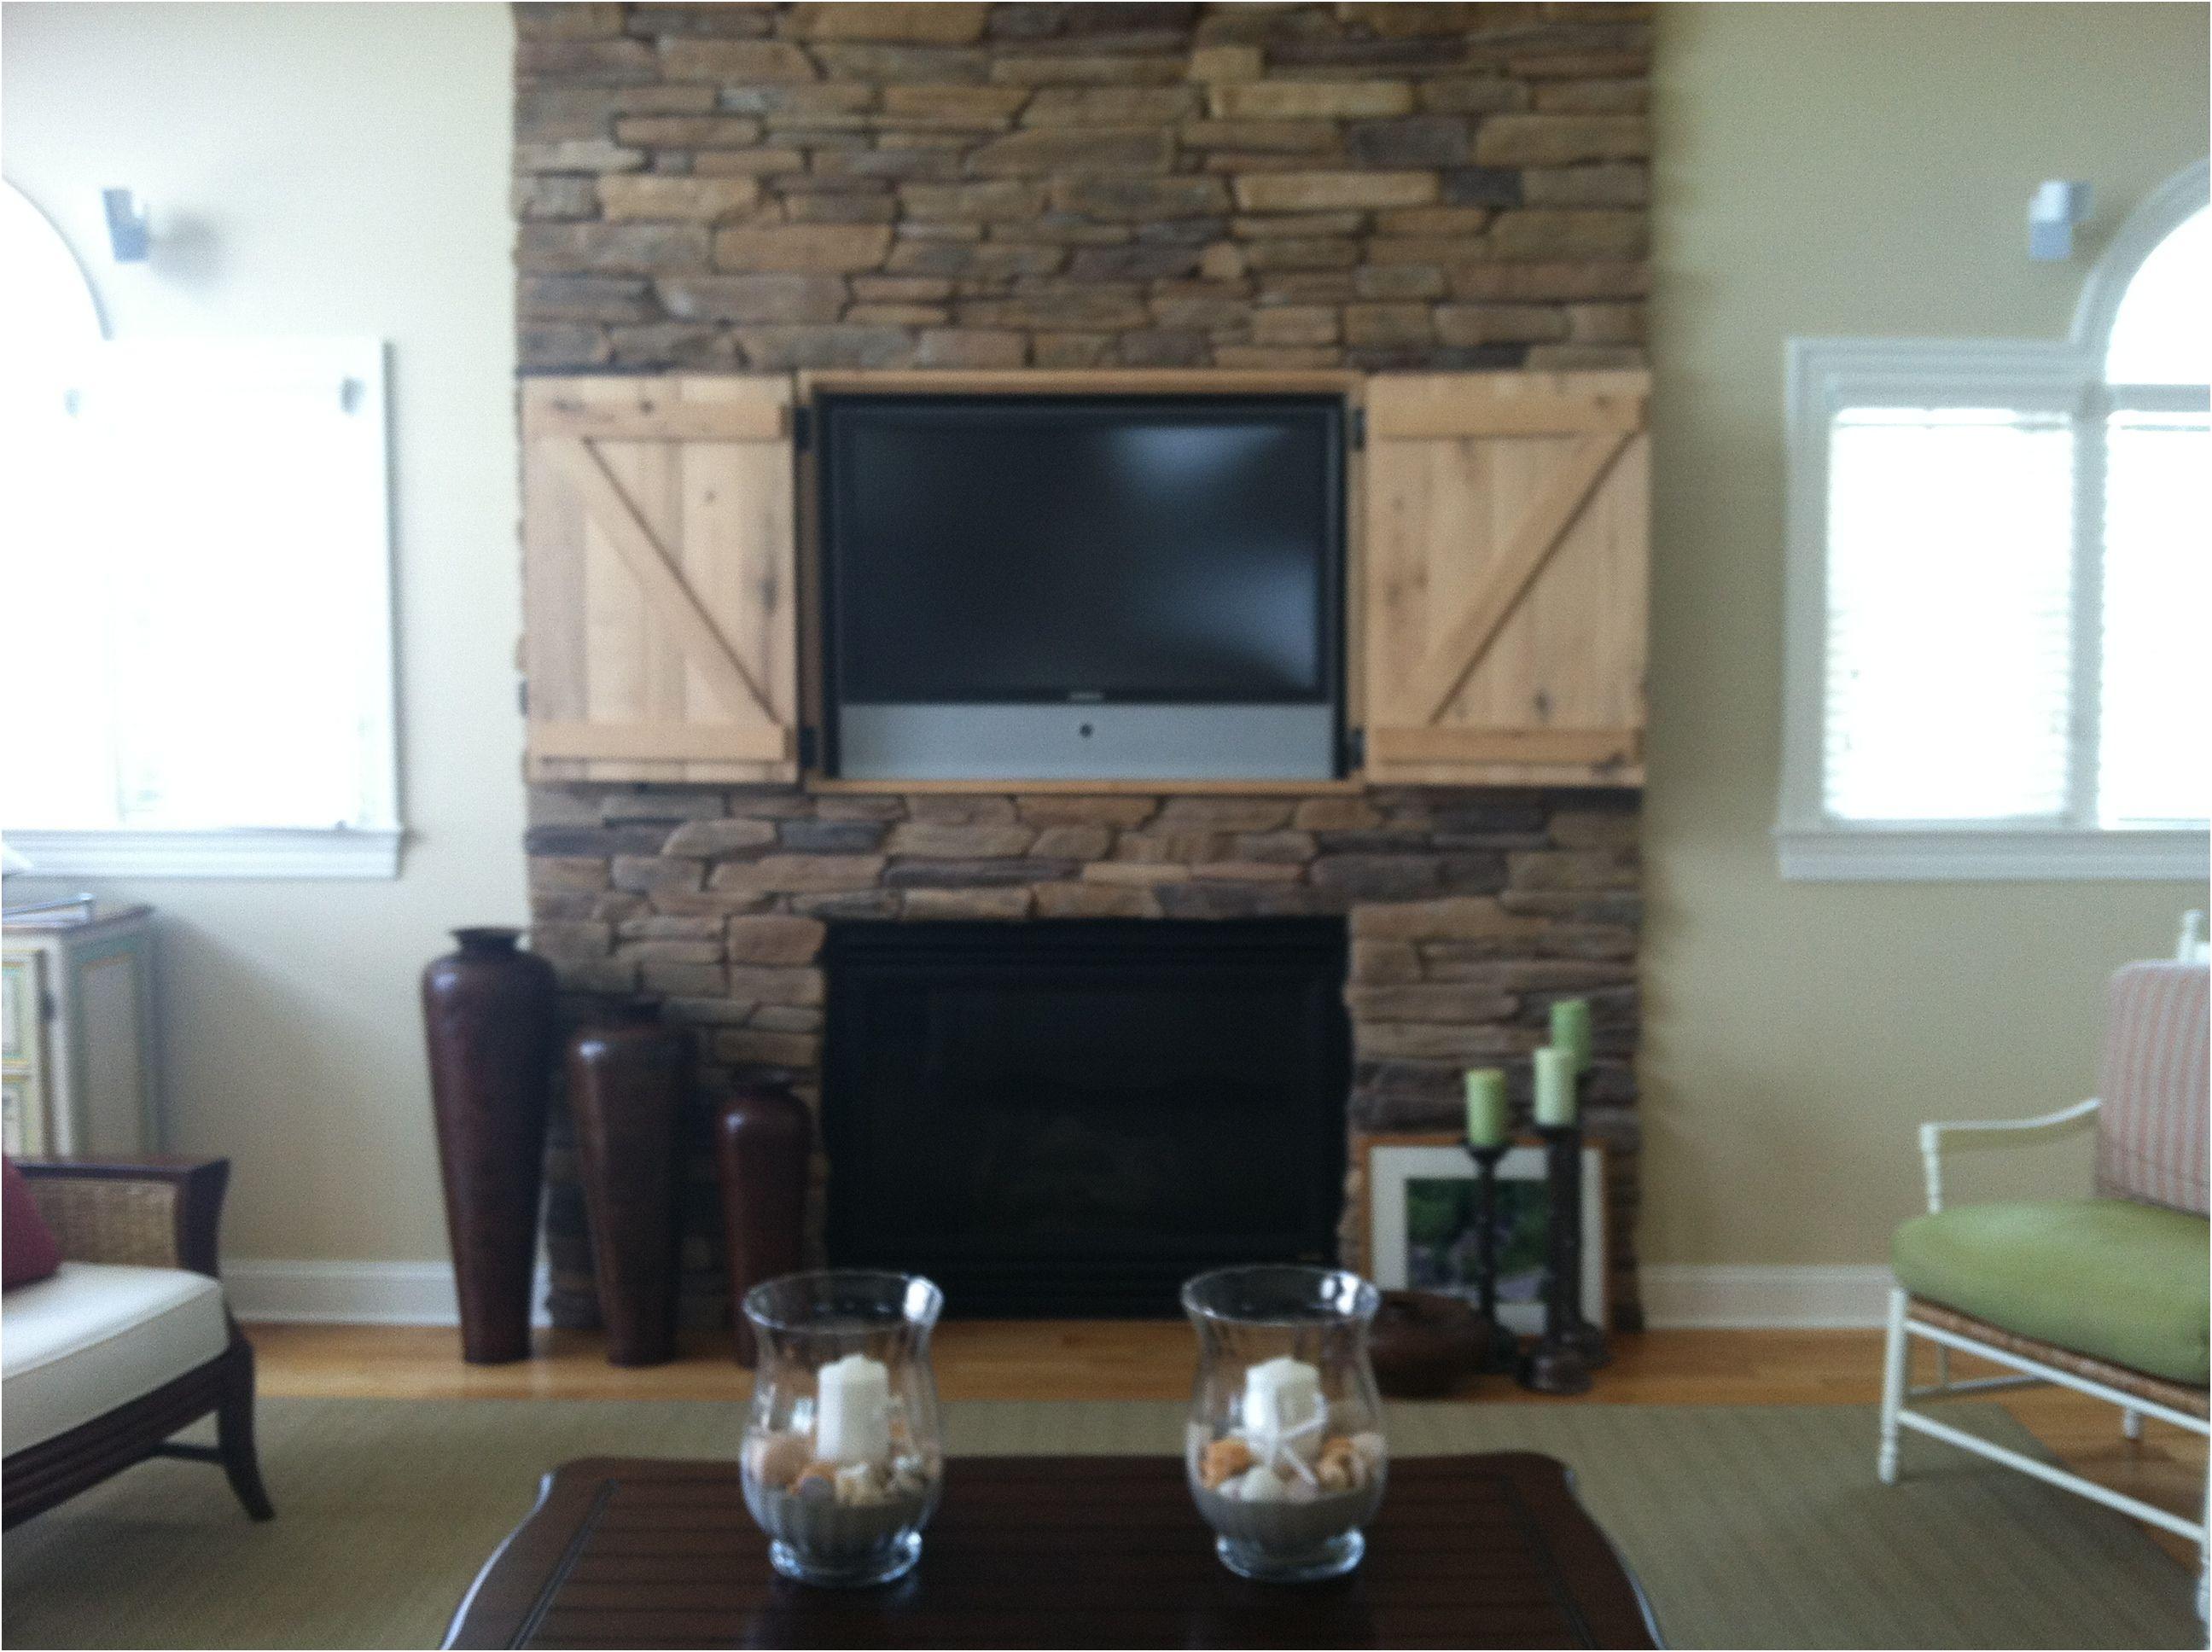 Elegant Tv Over the Fireplace Ideas